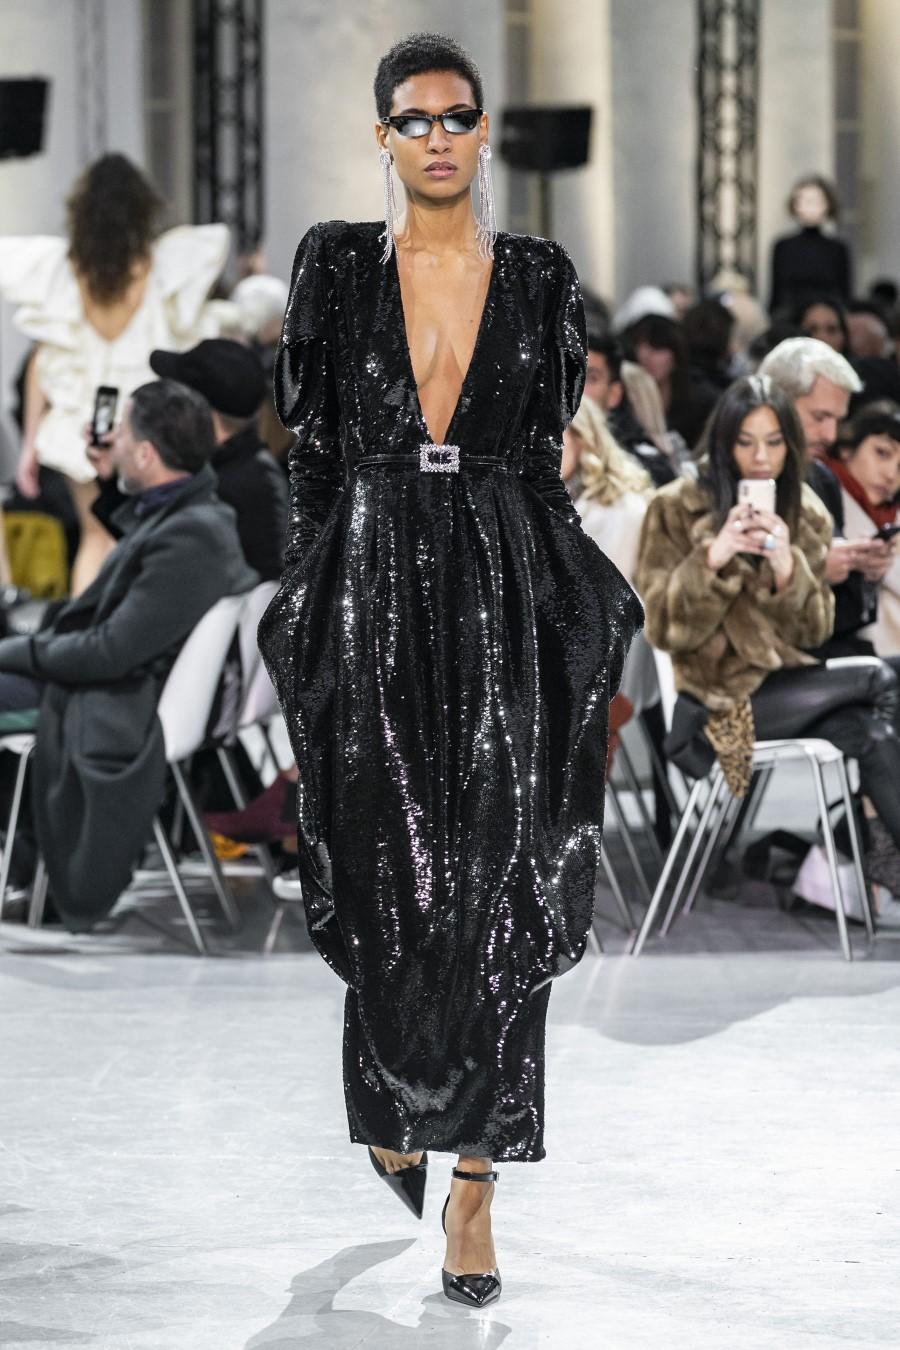 Alexandre Vauthier Haute Couture Spring Summer 2019